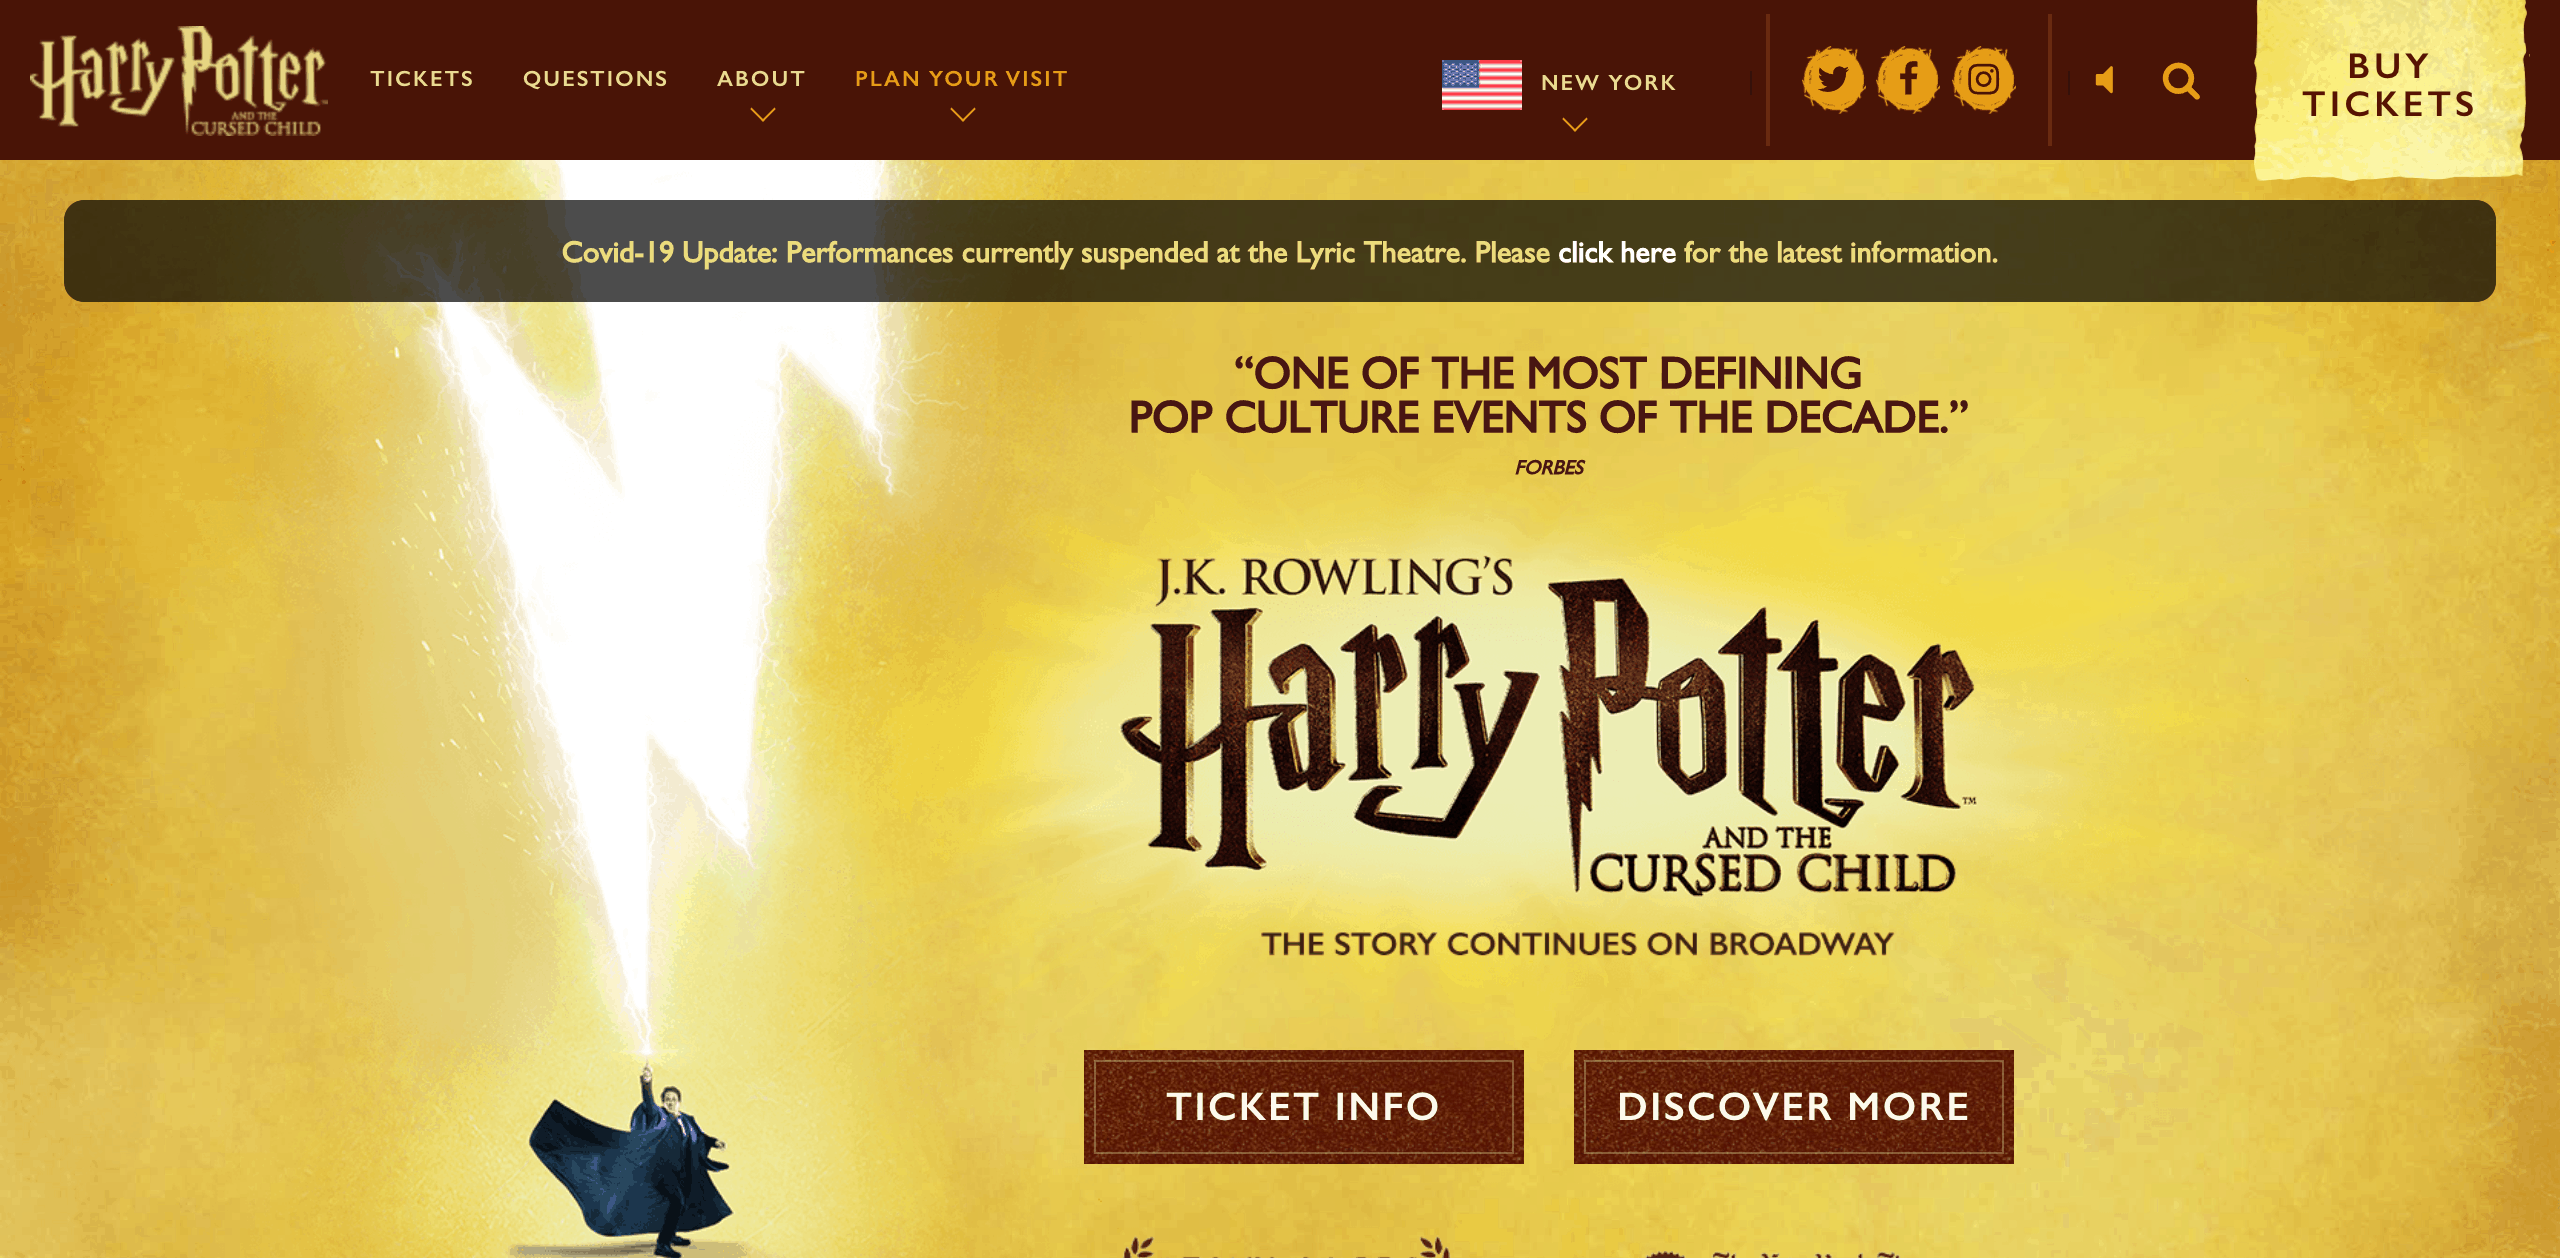 Harry Potter play: 2019 ~ WordPress development expert